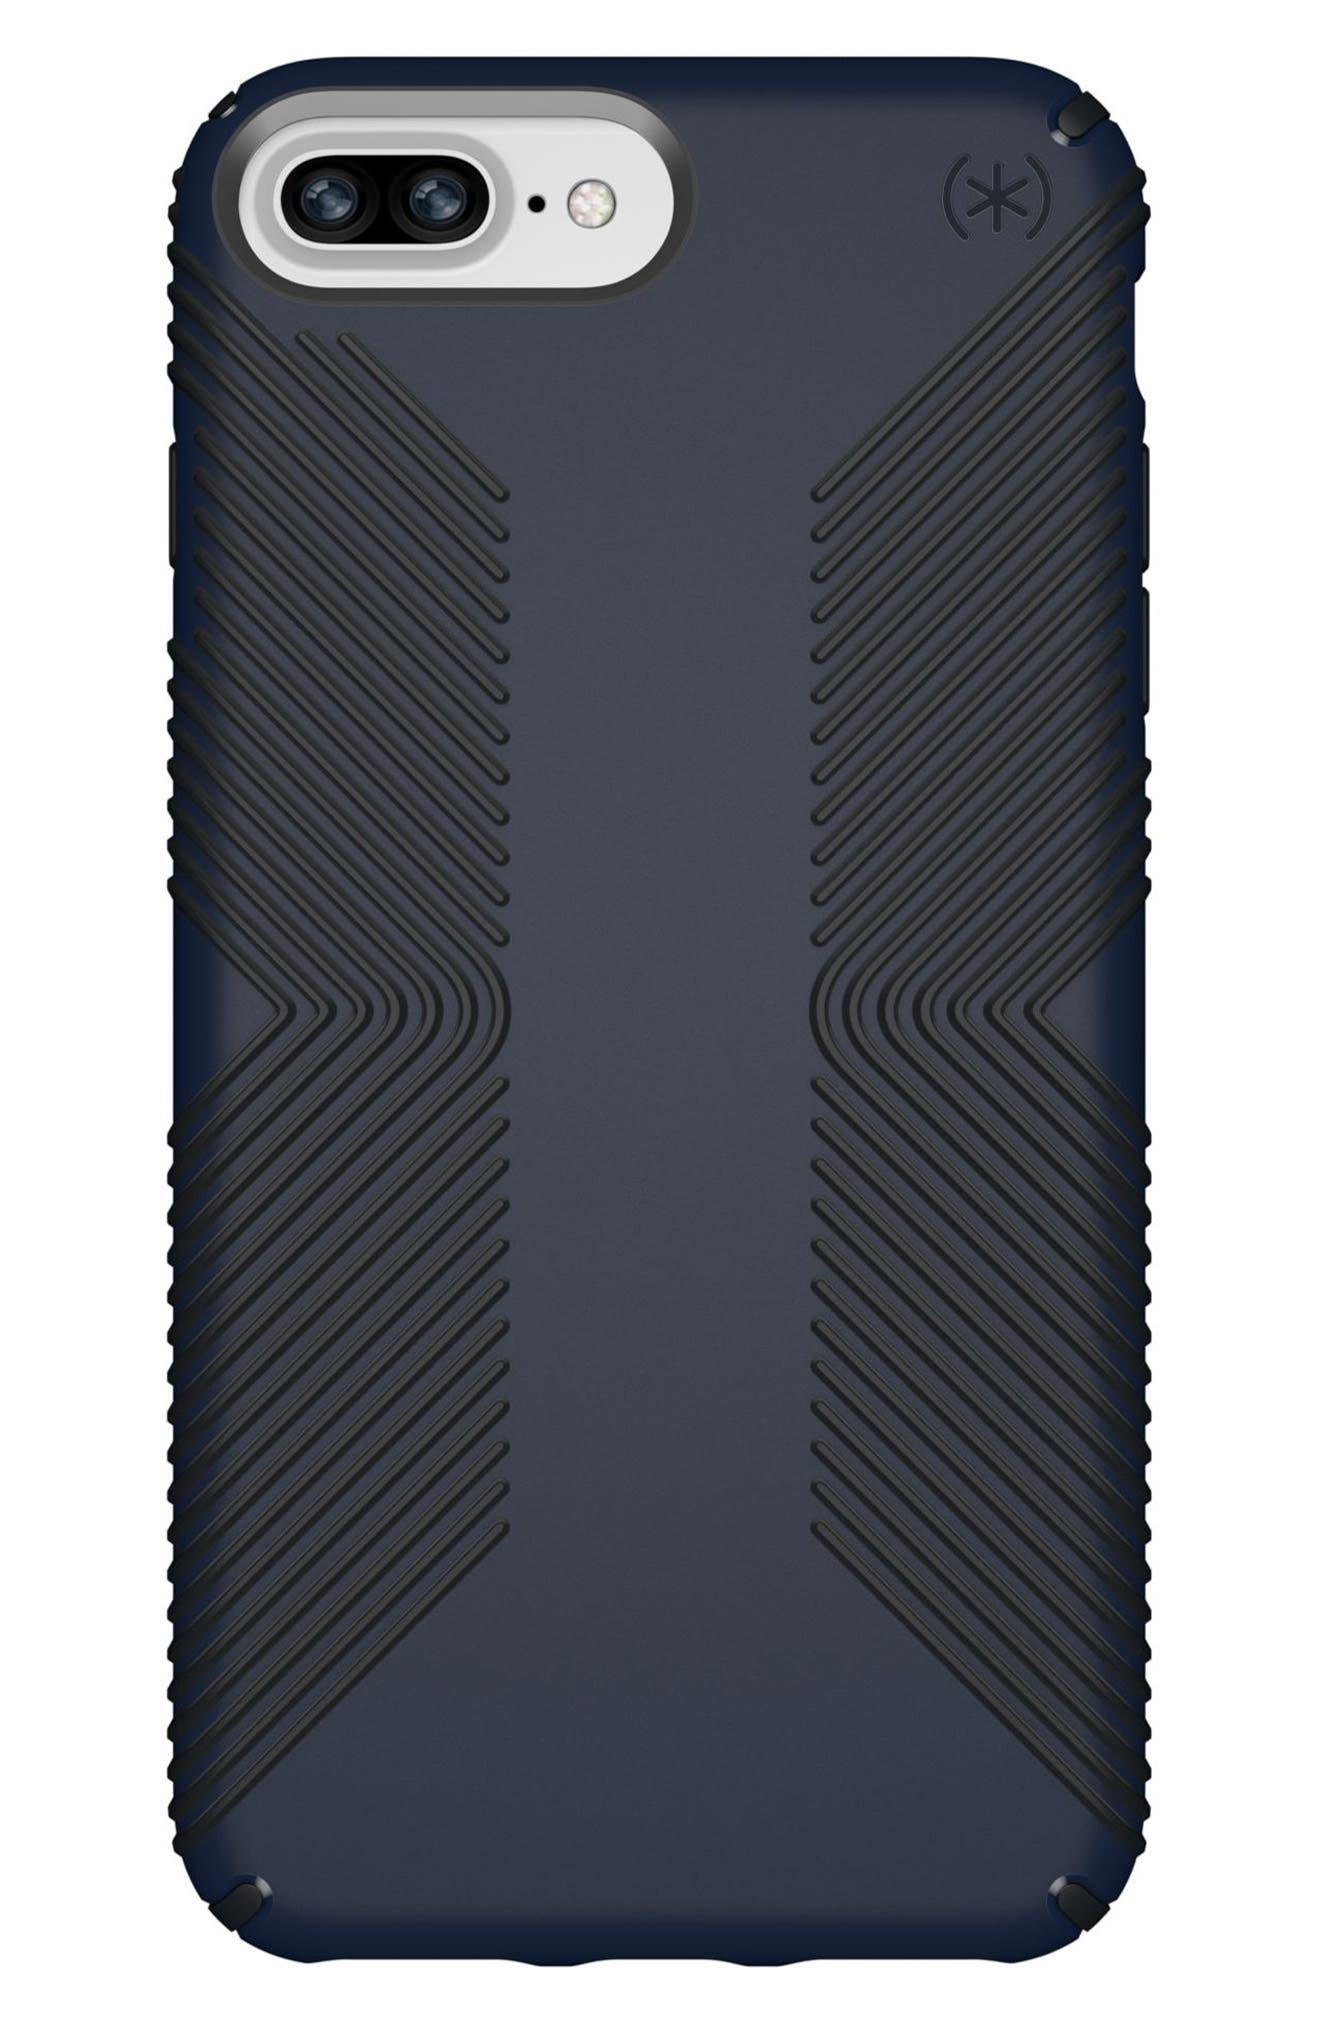 Alternate Image 1 Selected - Speck Grip iPhone 6/6s/7/8 Plus Case